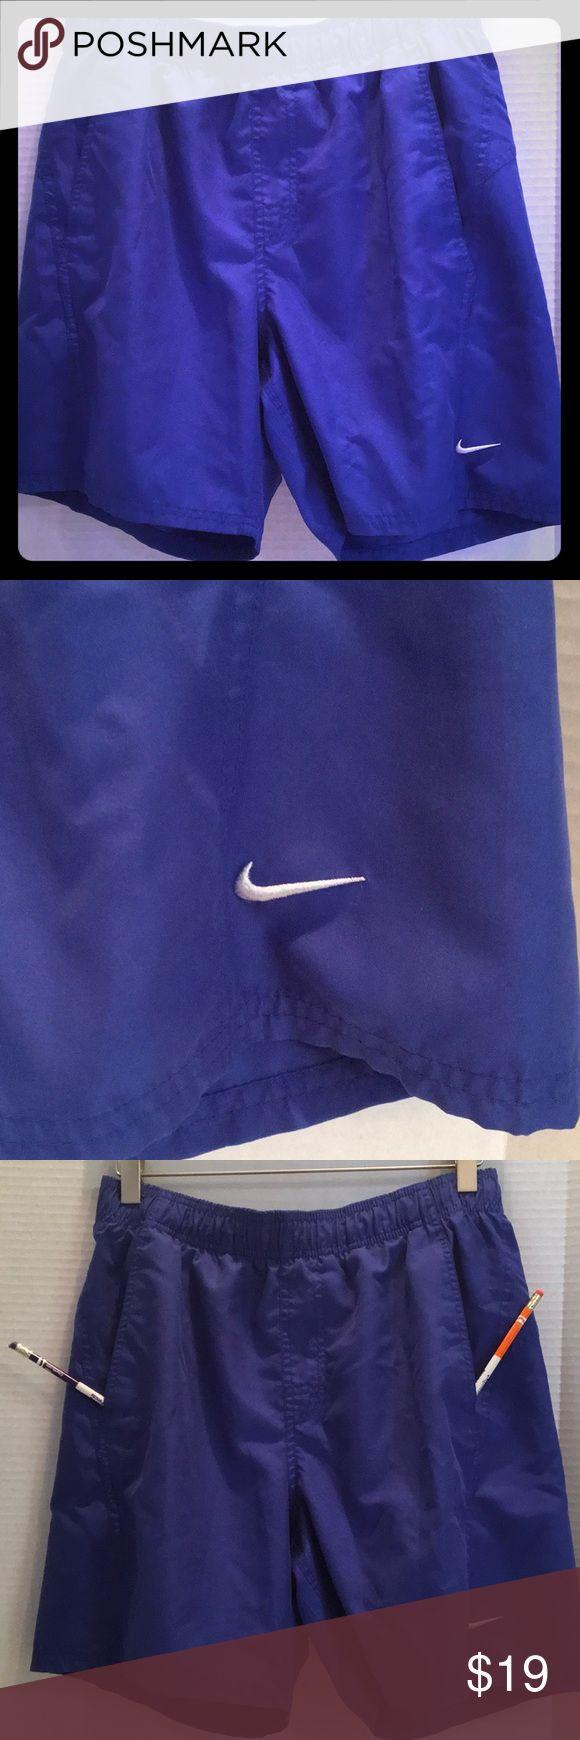 "NIKE Swim Shorts Workout Mesh Lining Royal Blue M Elastic waistband, mesh lined, 2 Pockets NIKE workout swim shorts, interior mesh pocket, Nike laces inside to adjust waist..... Medium...30"" around waist unstretched....11 1/2"" RISE....17 1/8"" waistband to edge of short. EUC [ A-8]✌️💠✌️💠✌️💠 Nike Shorts"